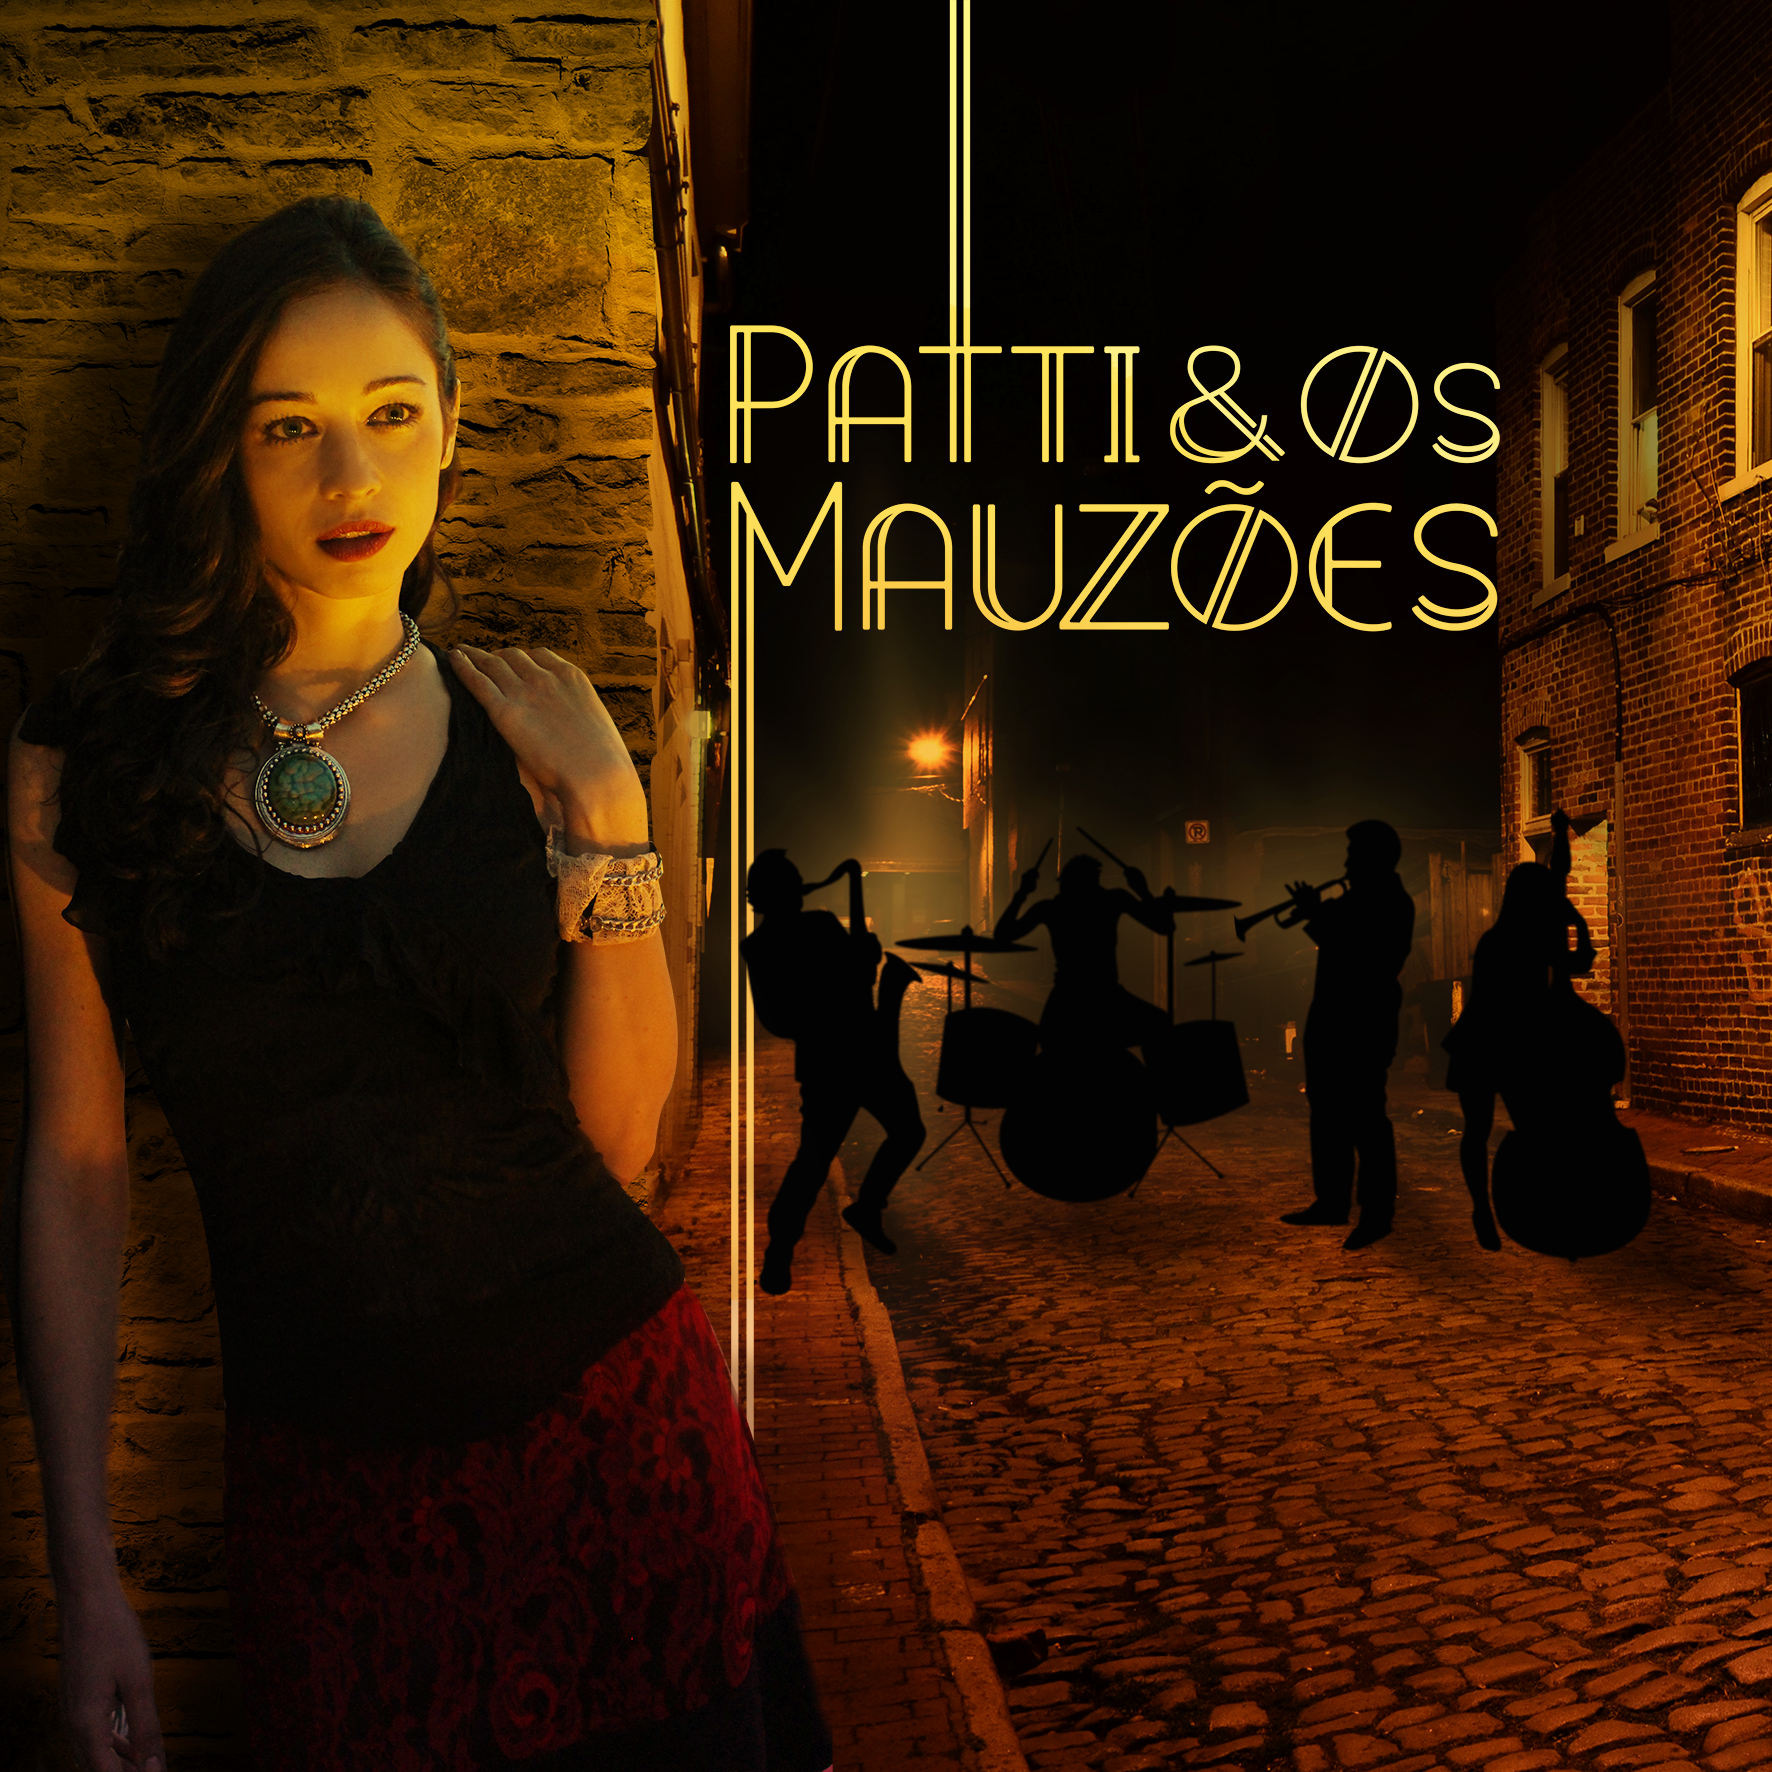 Patti & Os Mauzões